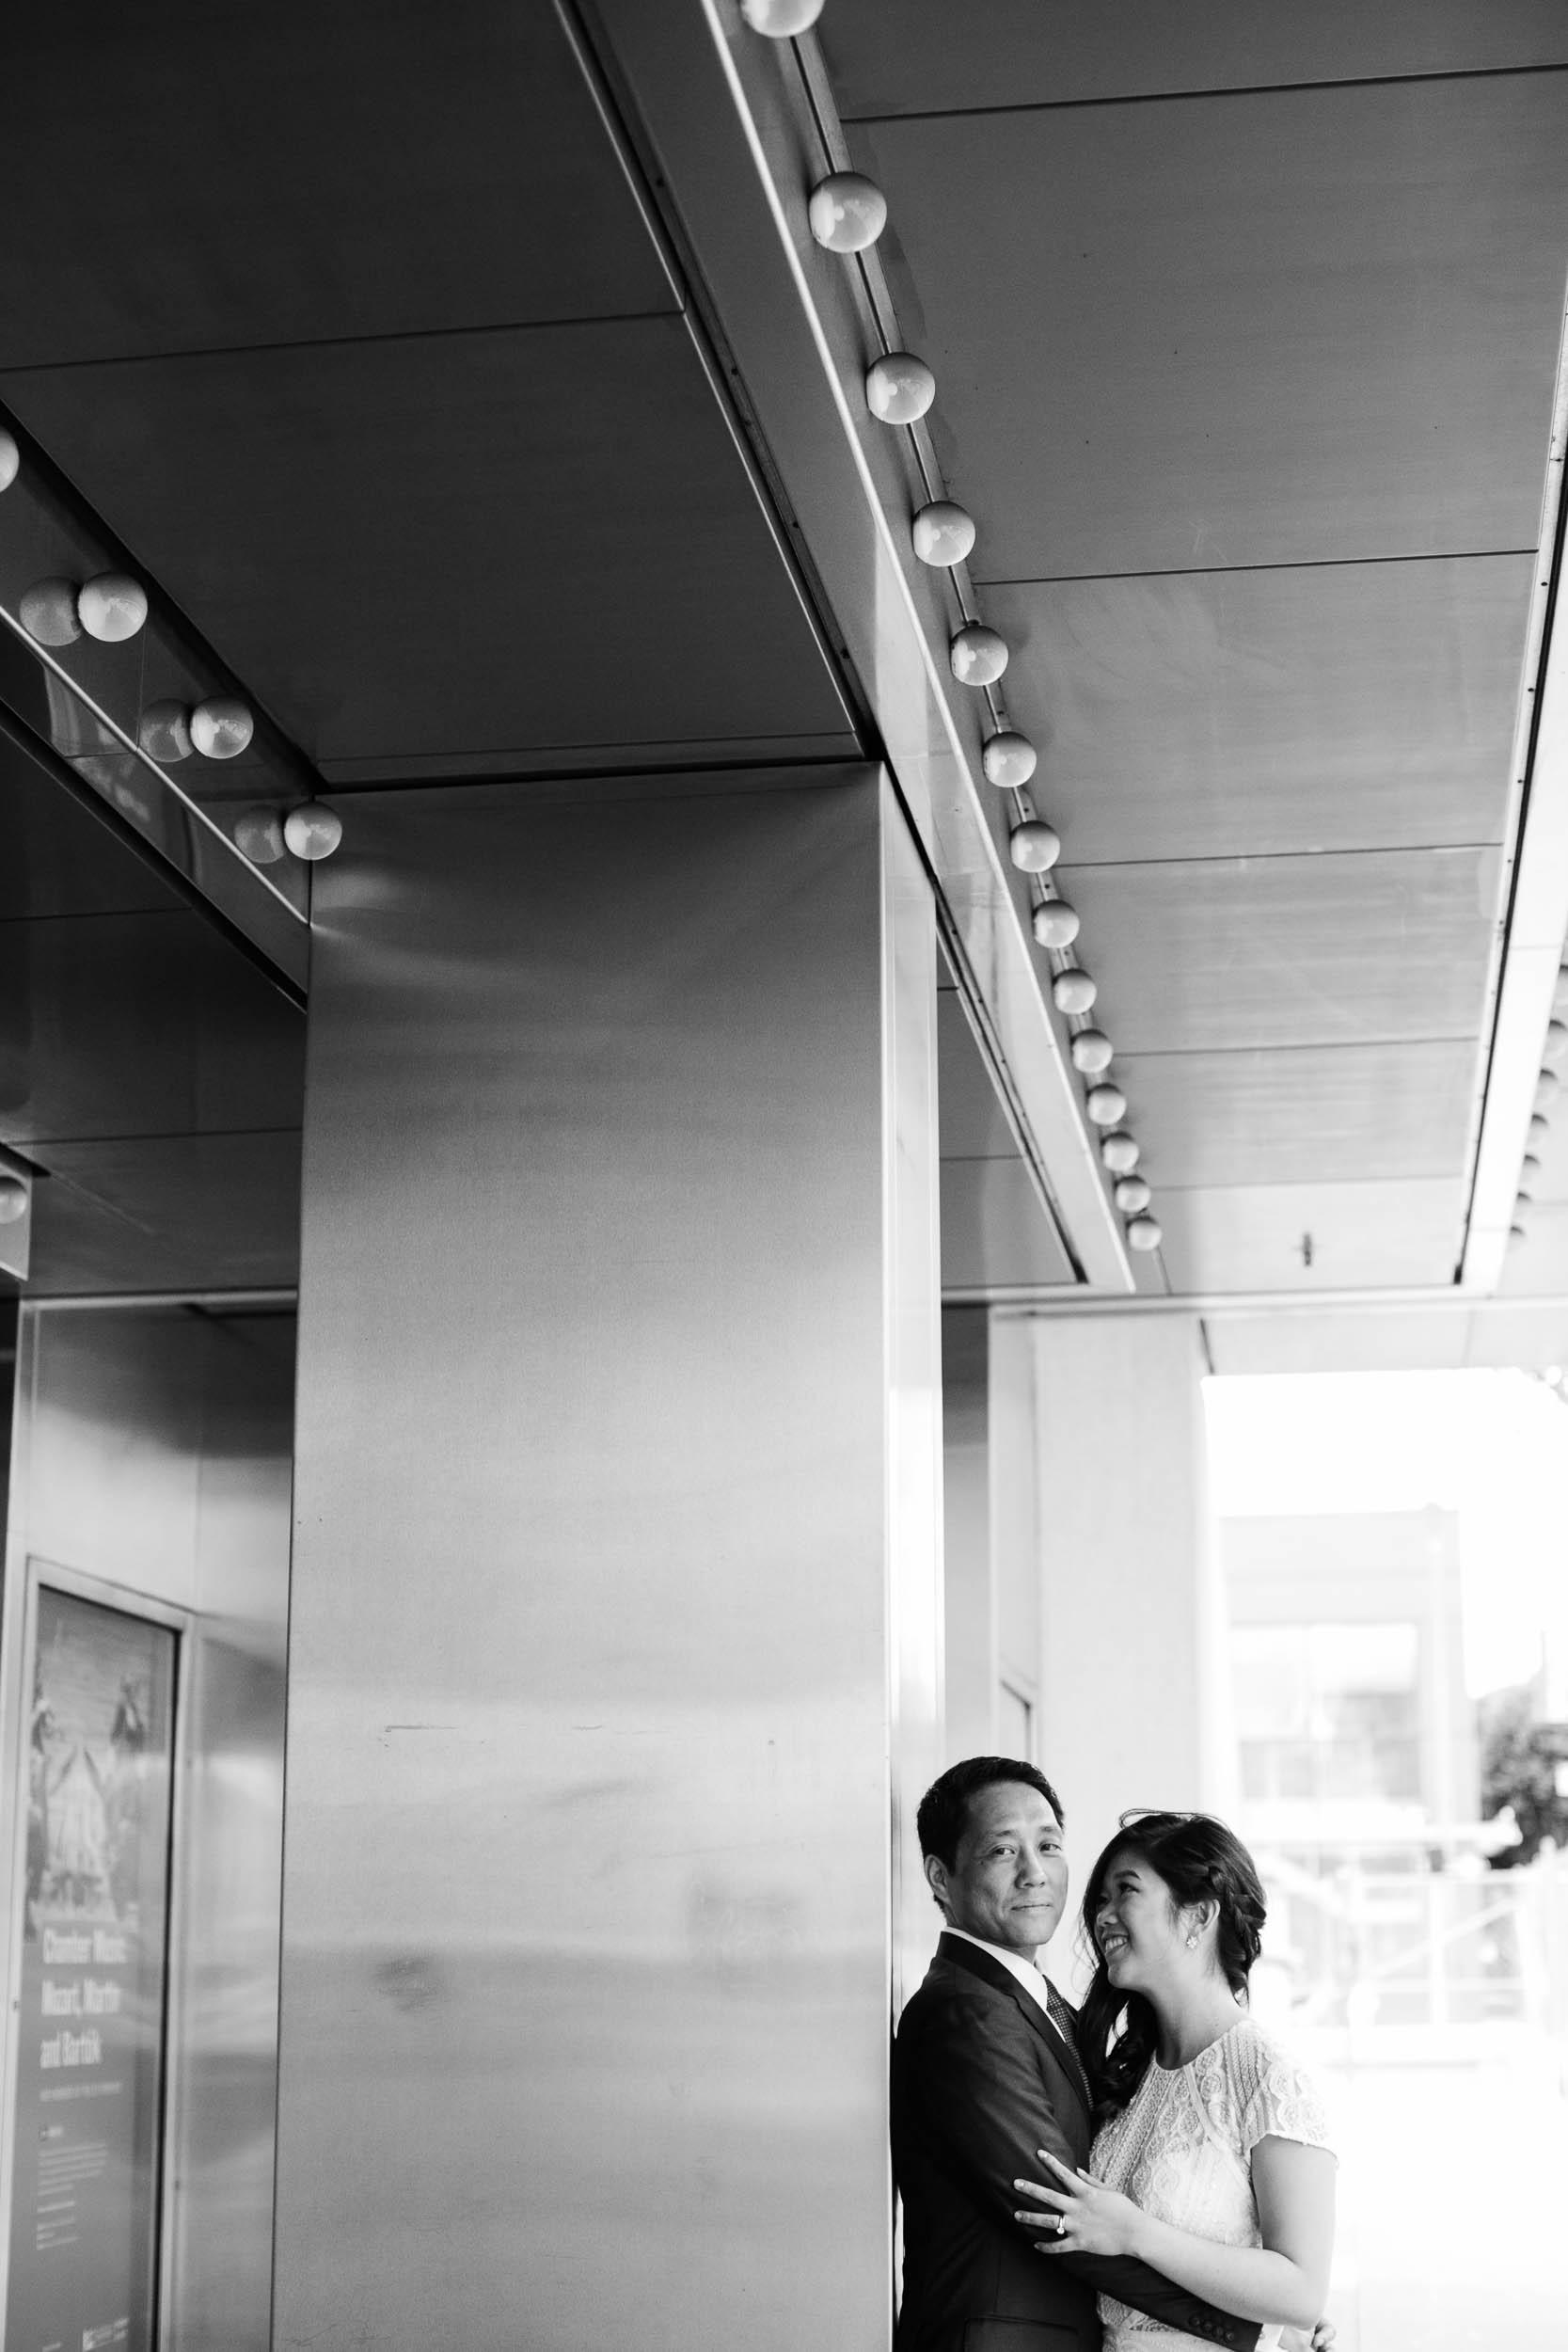 032118_M+D City Hall Wedding_Buena Lane Photography_1087.jpg